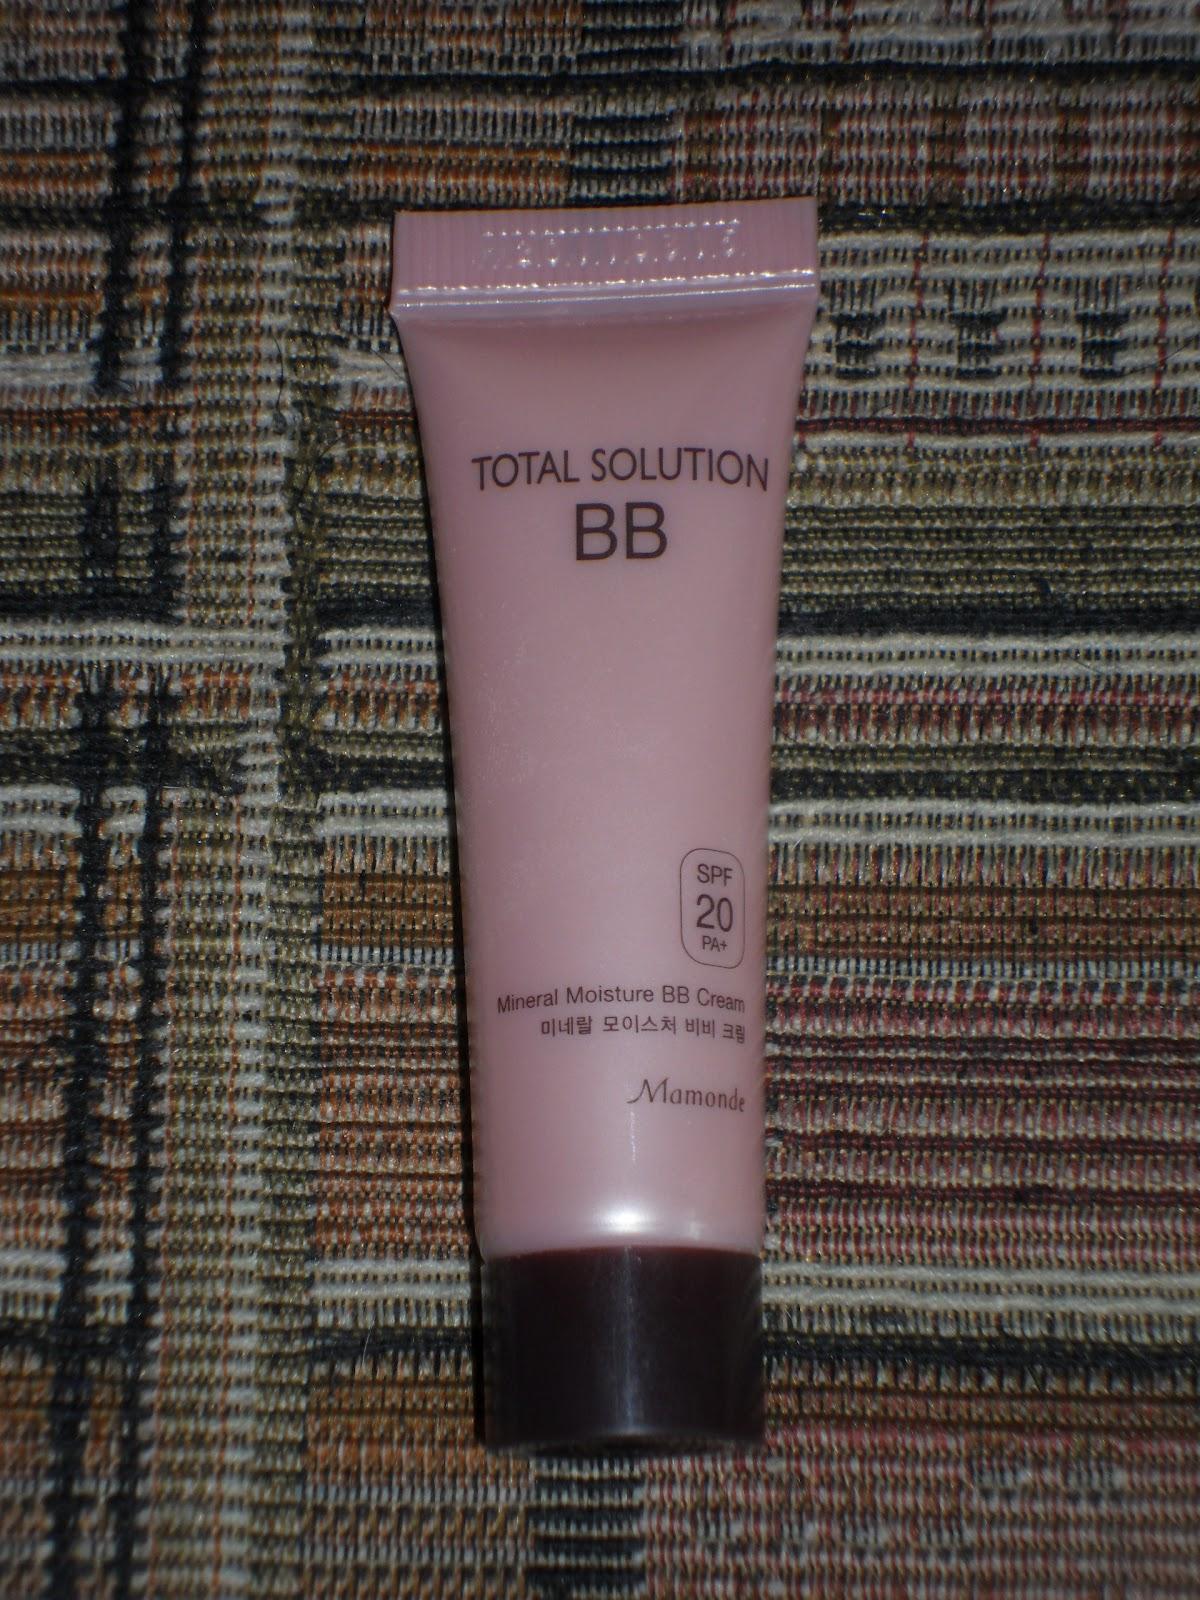 66 mamonde total solution mineral moisture bb cream. Black Bedroom Furniture Sets. Home Design Ideas